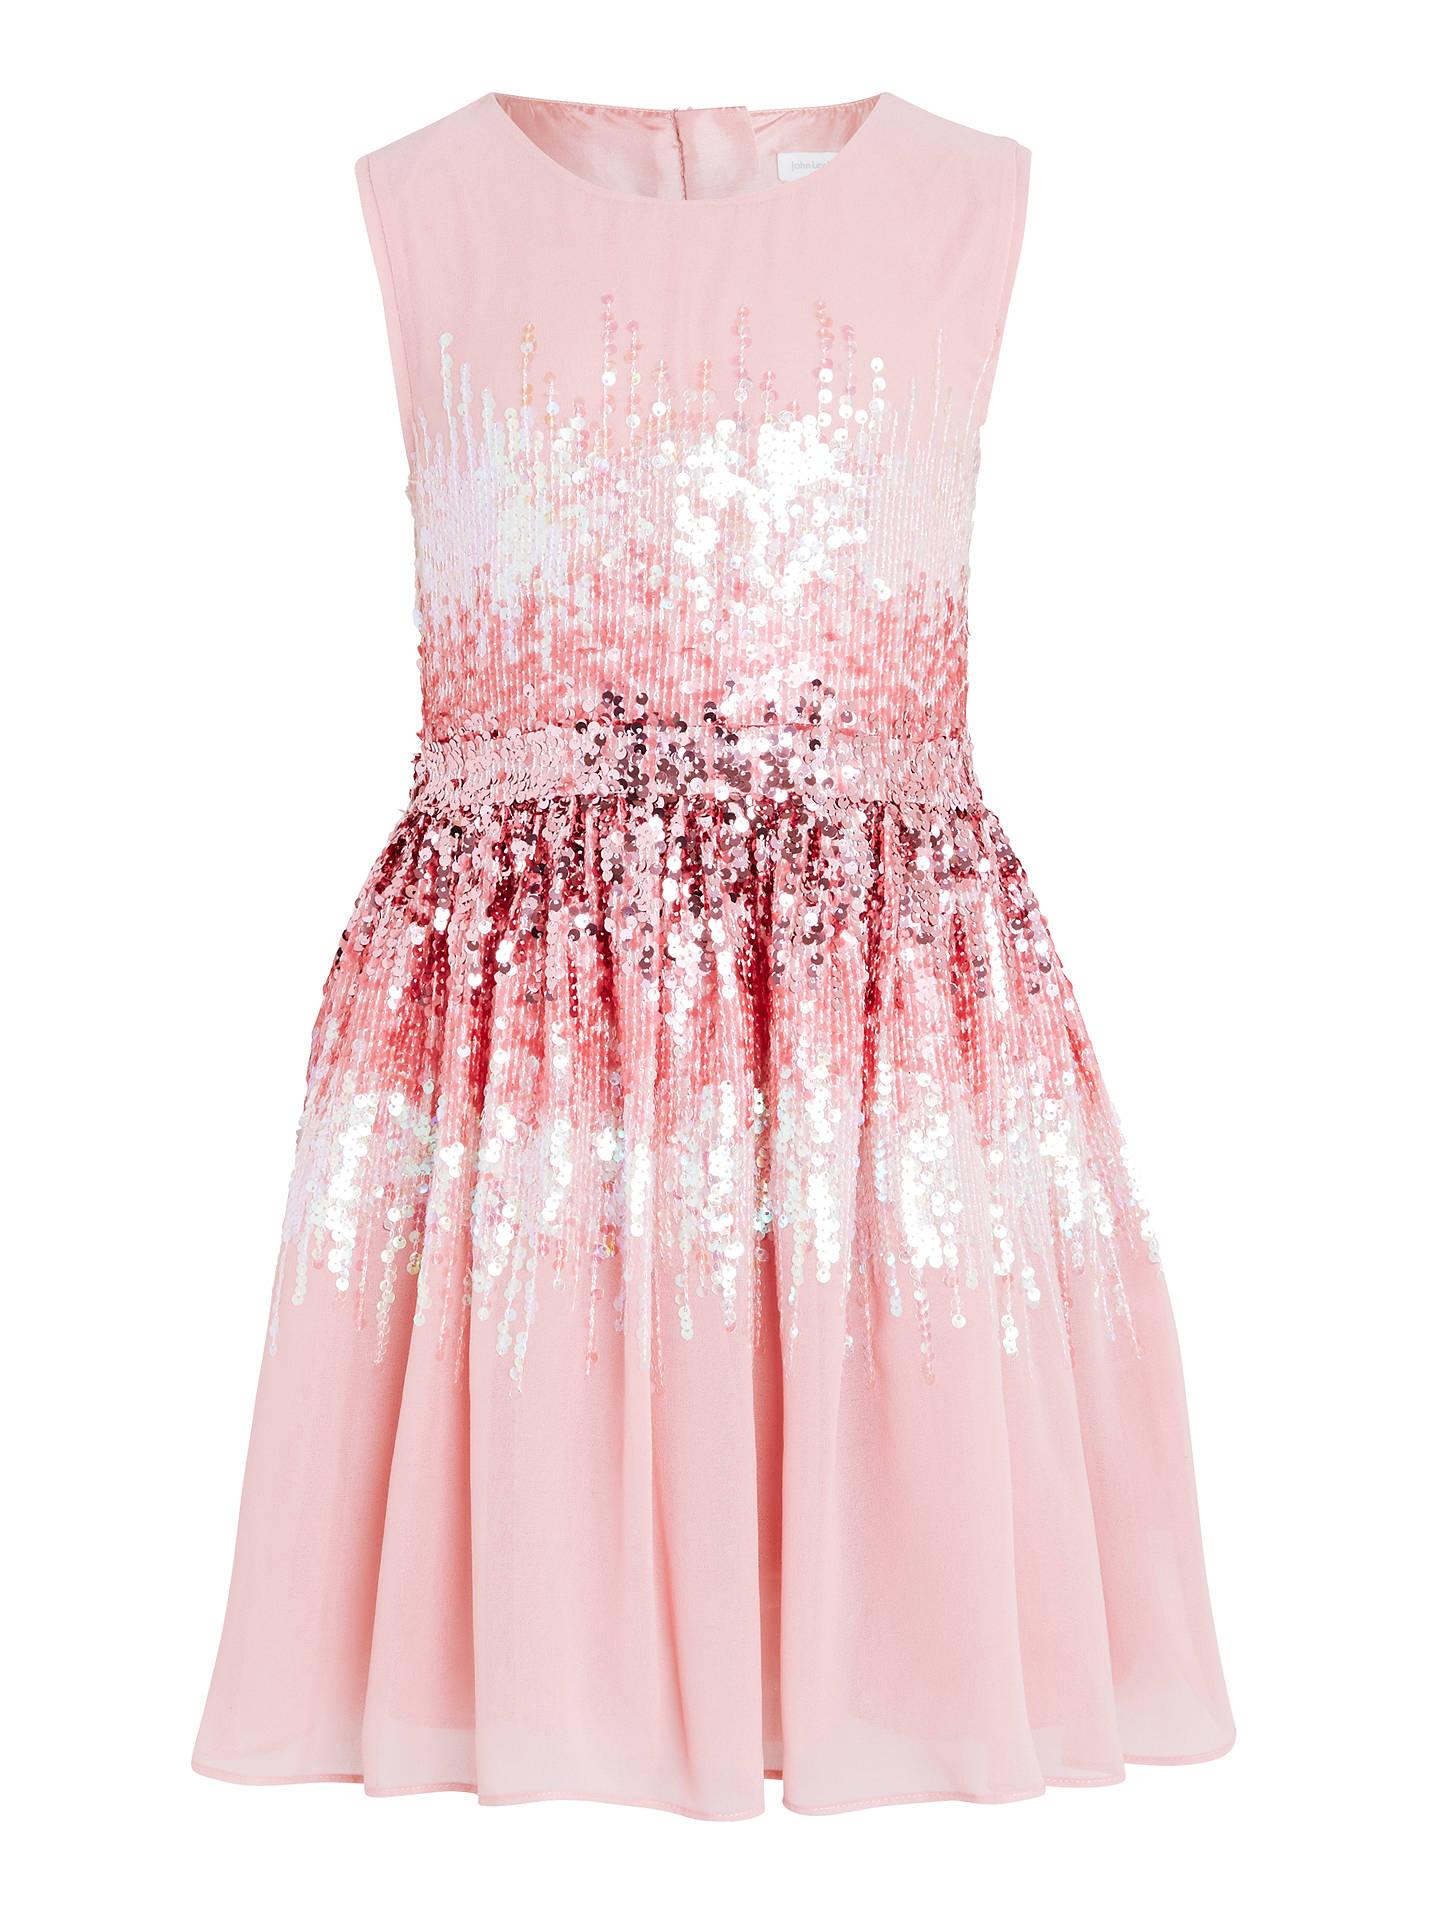 45fe458a88 Buy John Lewis Girls' Sequin Dress, Pink, 3 years Online at johnlewis.